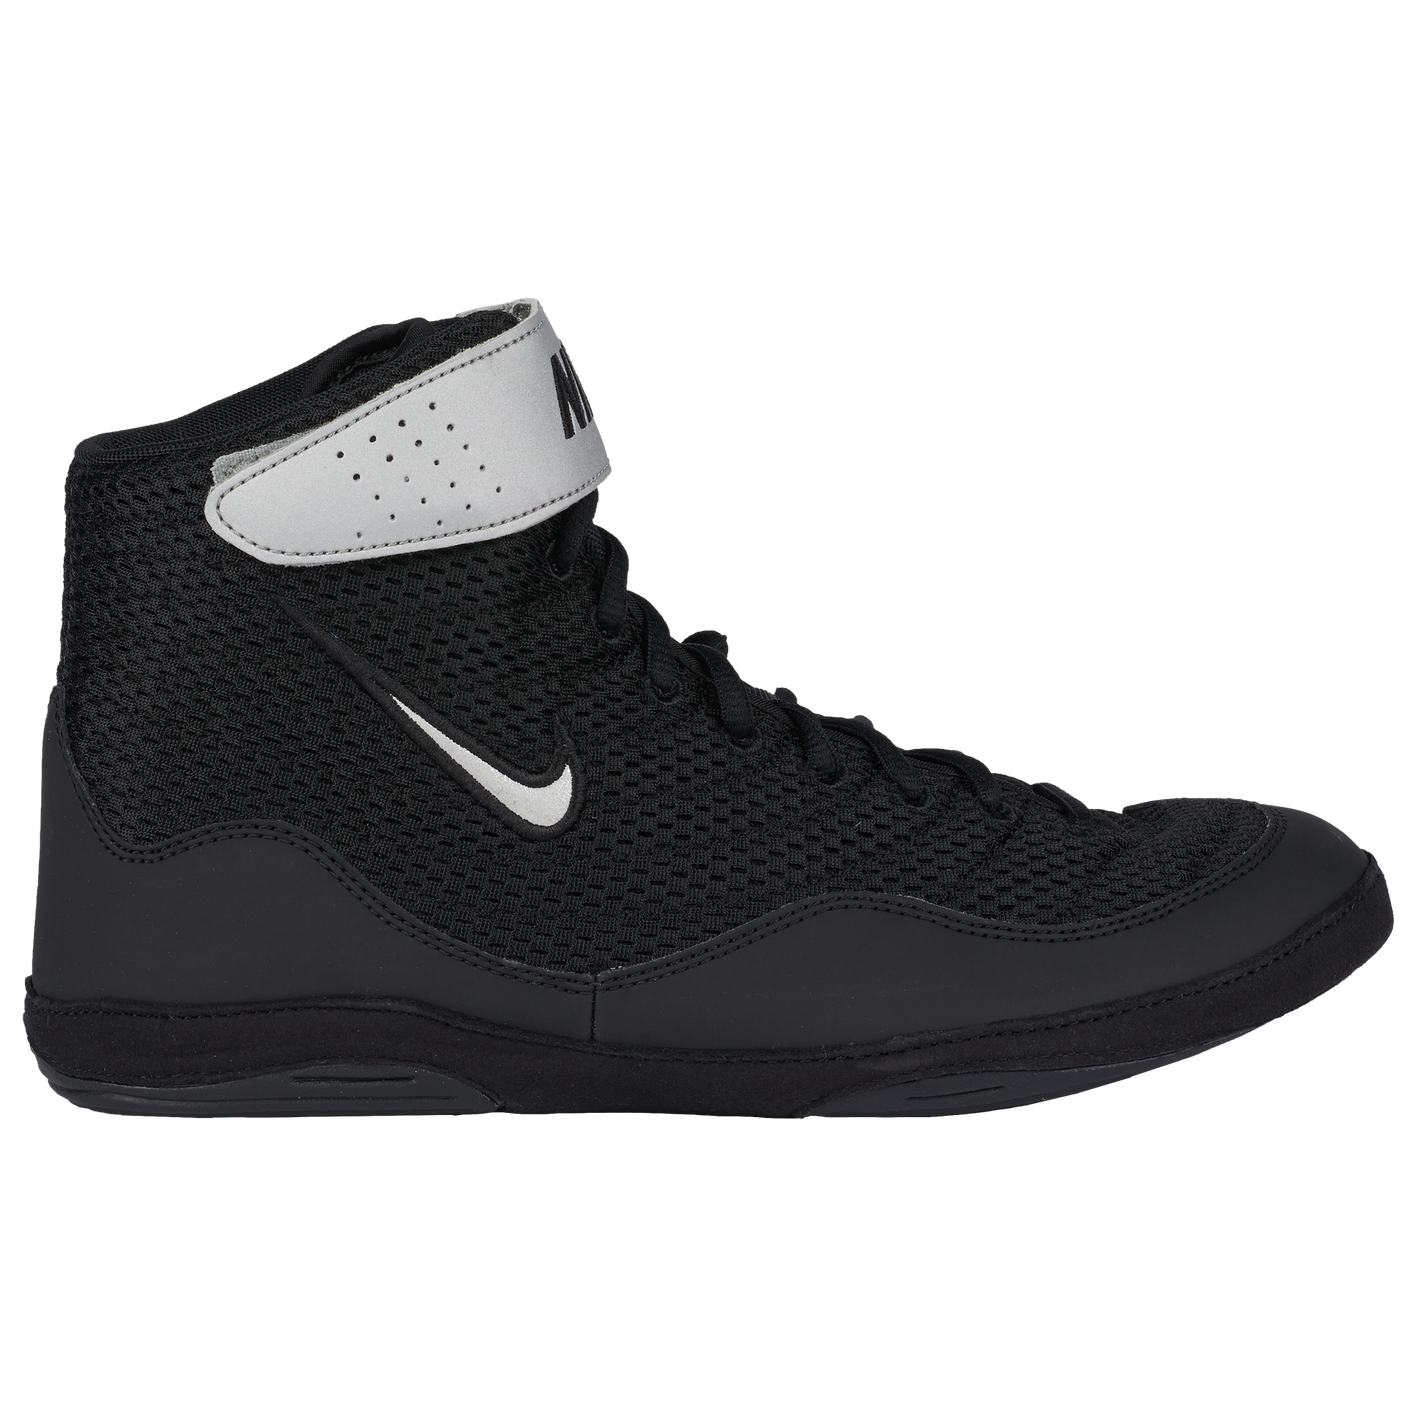 ba6364abbe2 Nike Inflict 3 - Men s - Wrestling - Shoes - Black Metallic Silver White